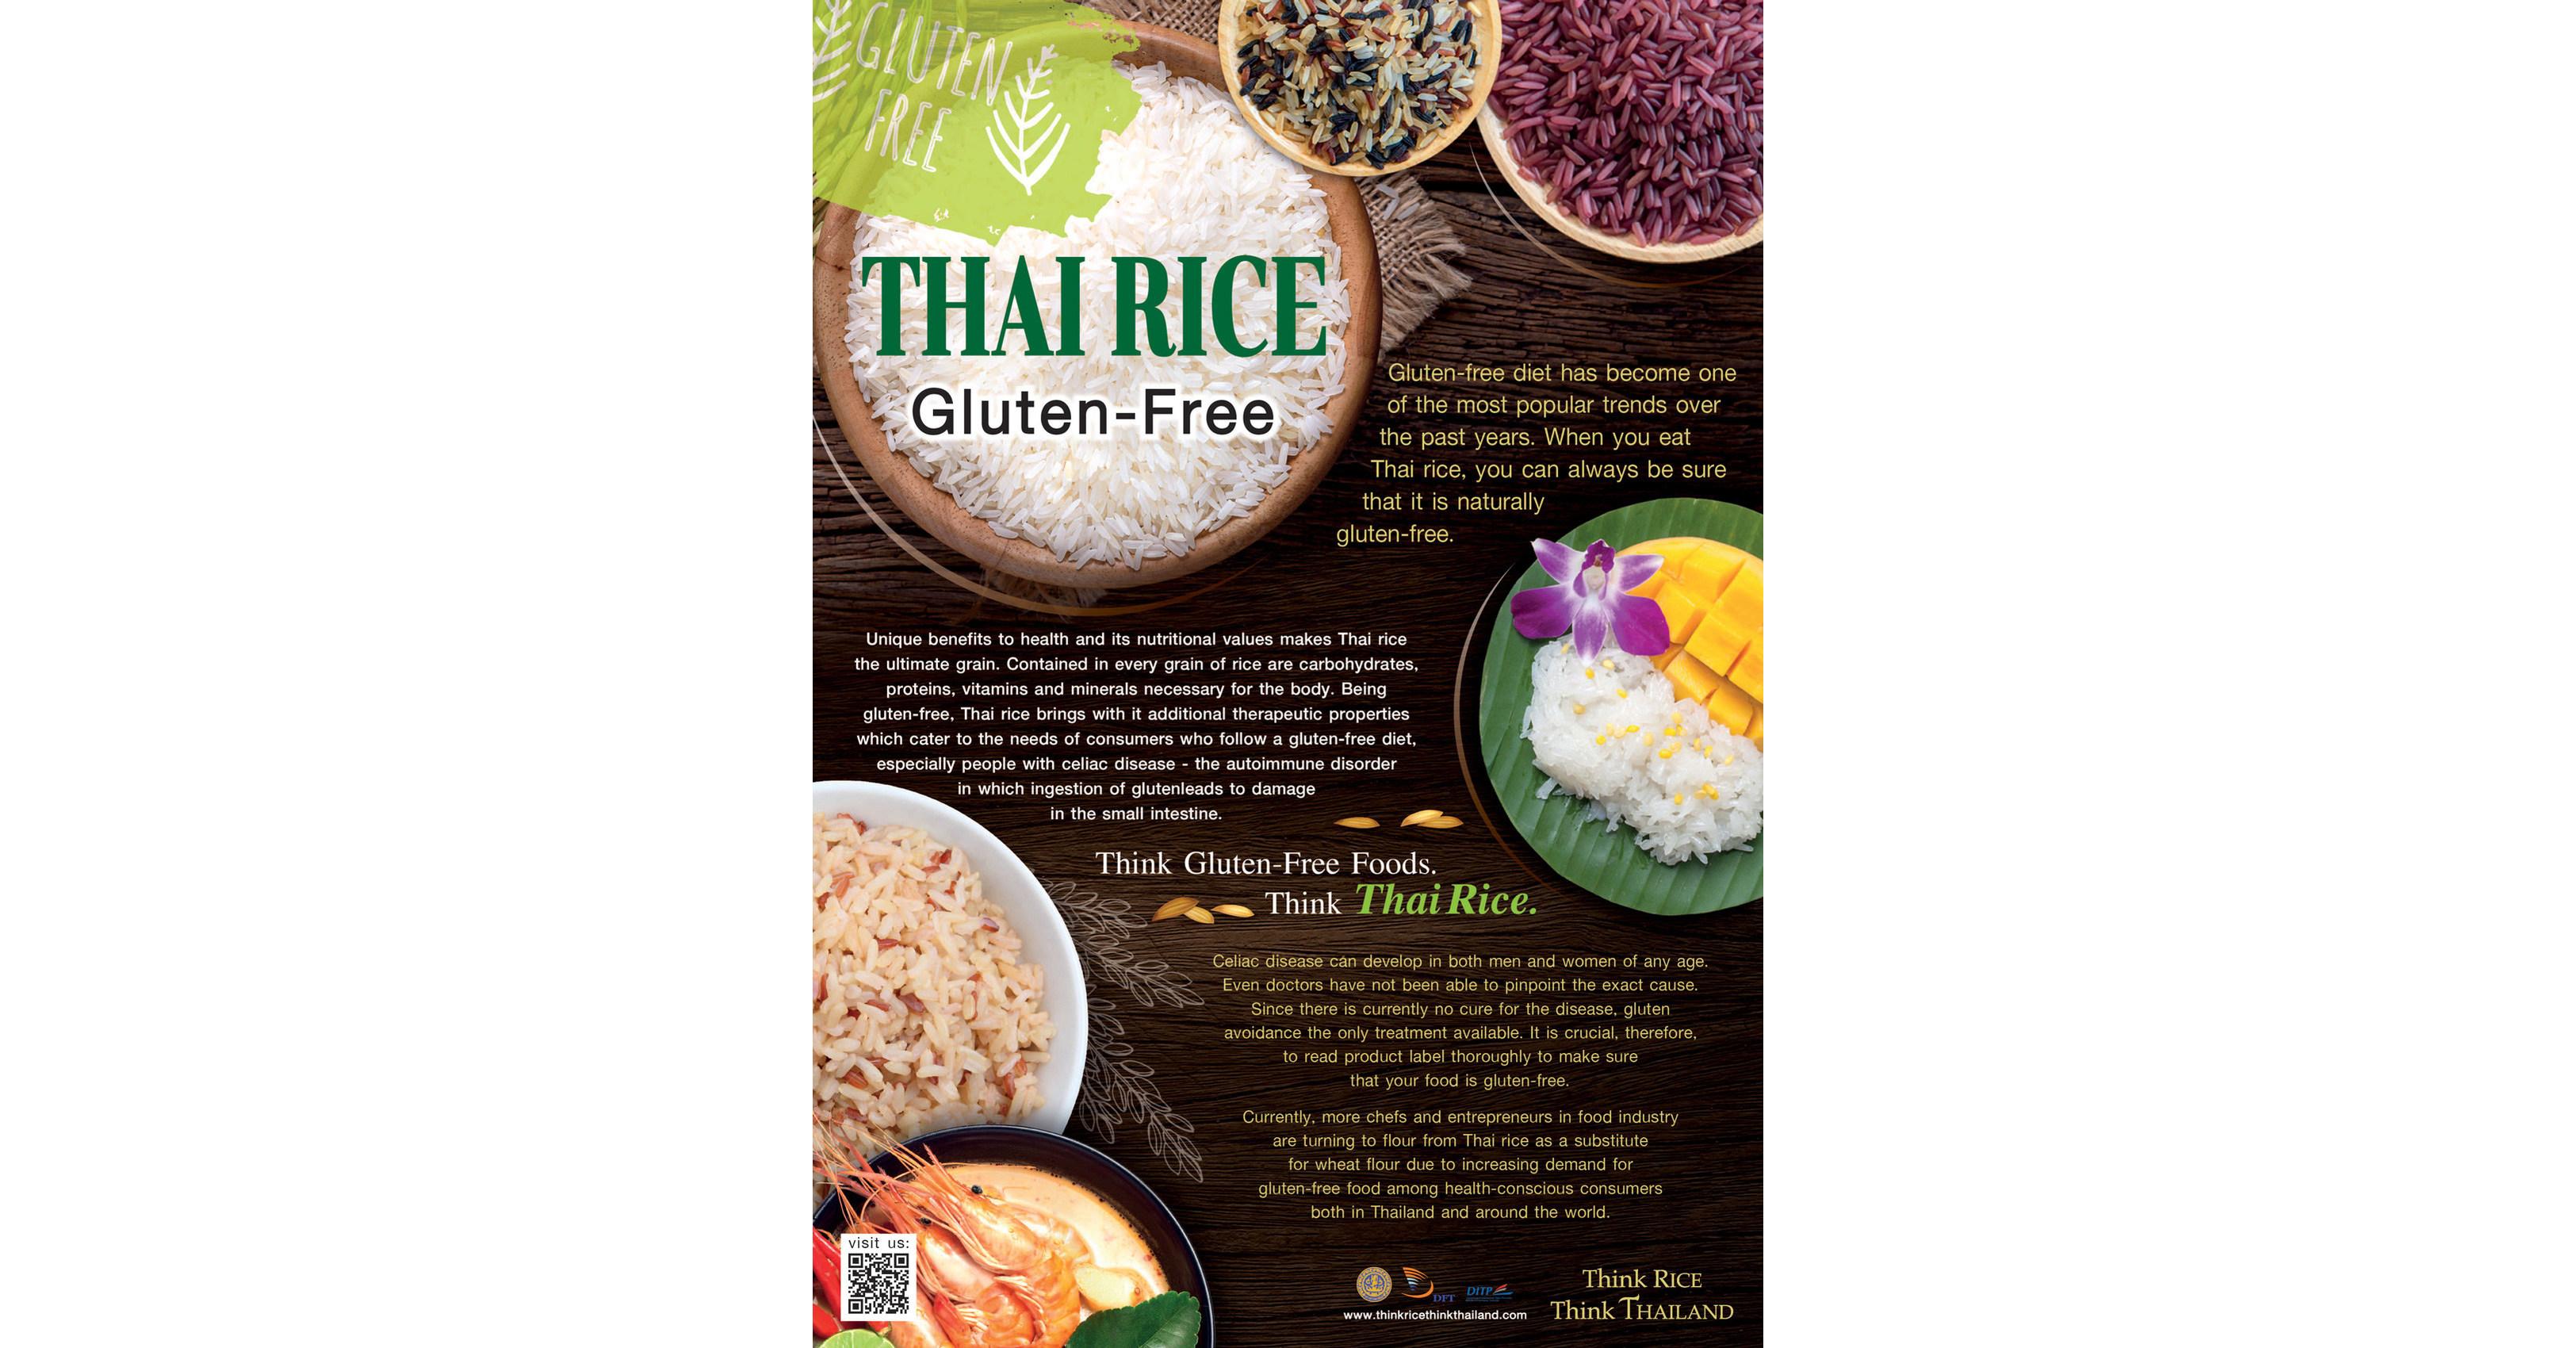 Thai Rice Plays Big Role as Gluten-free Diet